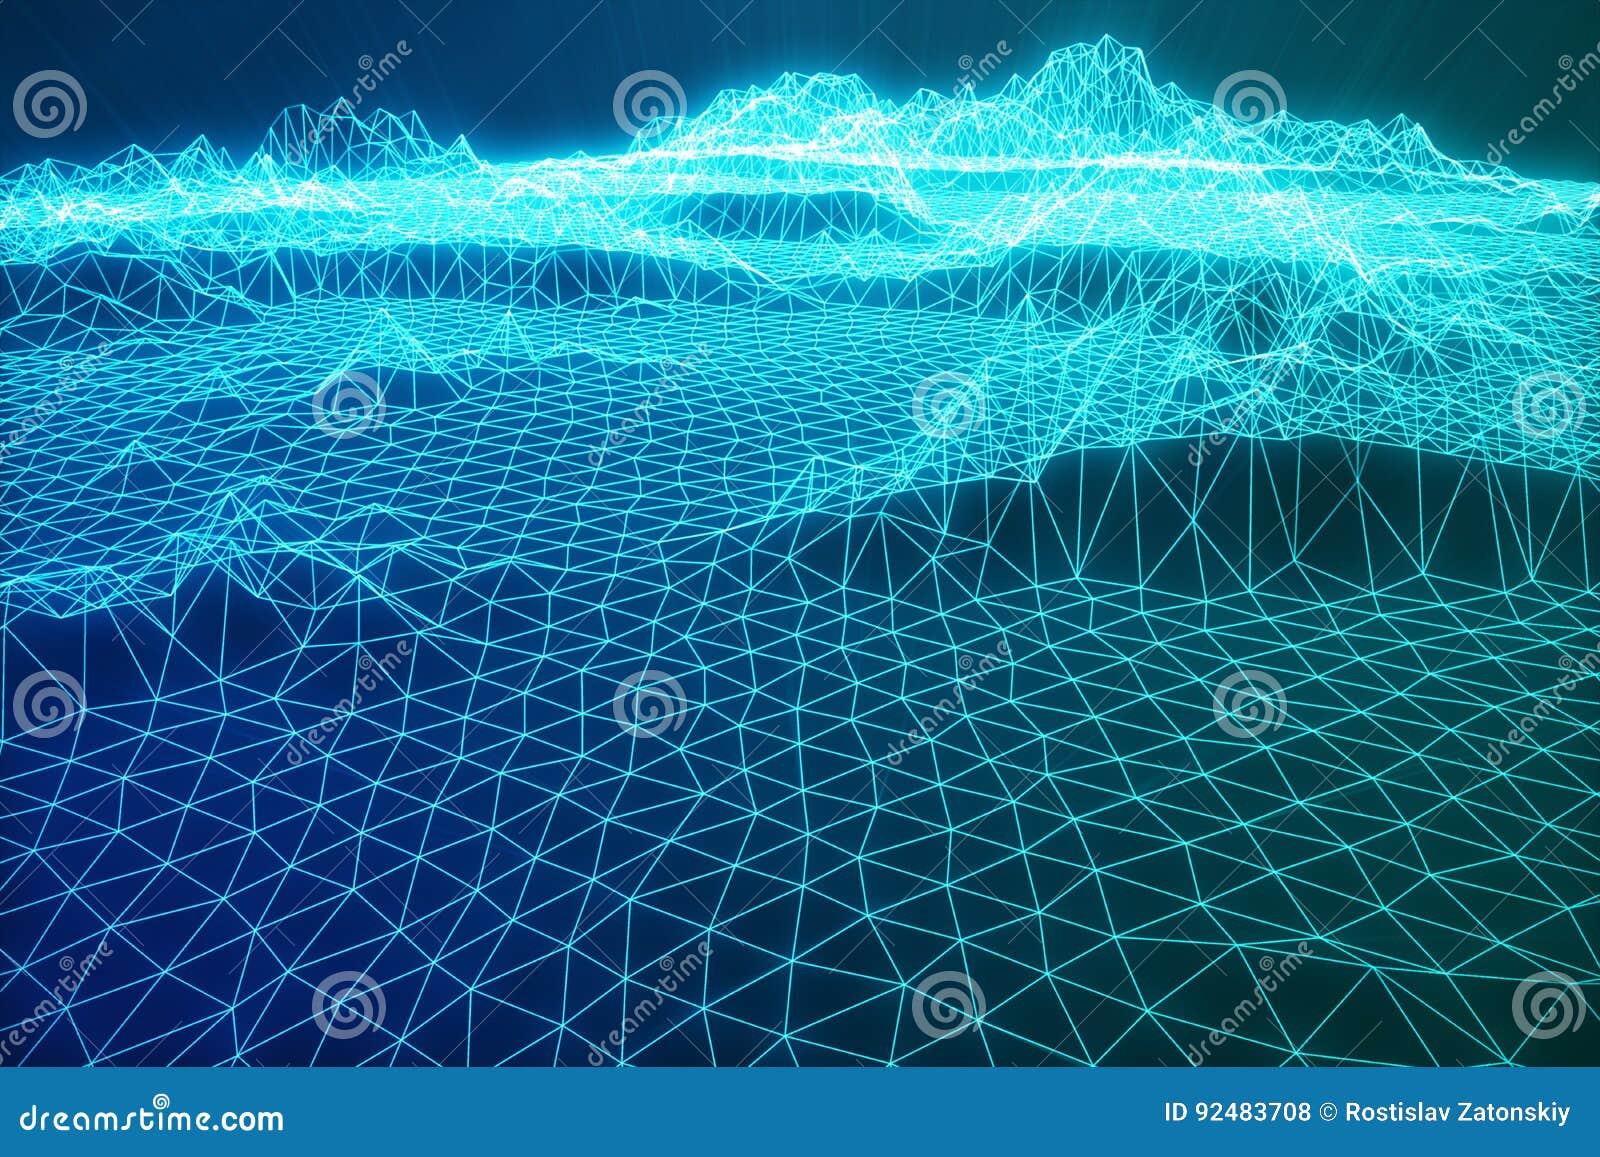 3D Illustration Abstract Digital Wireframe Landscape. Cyberspace Landscape Grid. 3d Technology